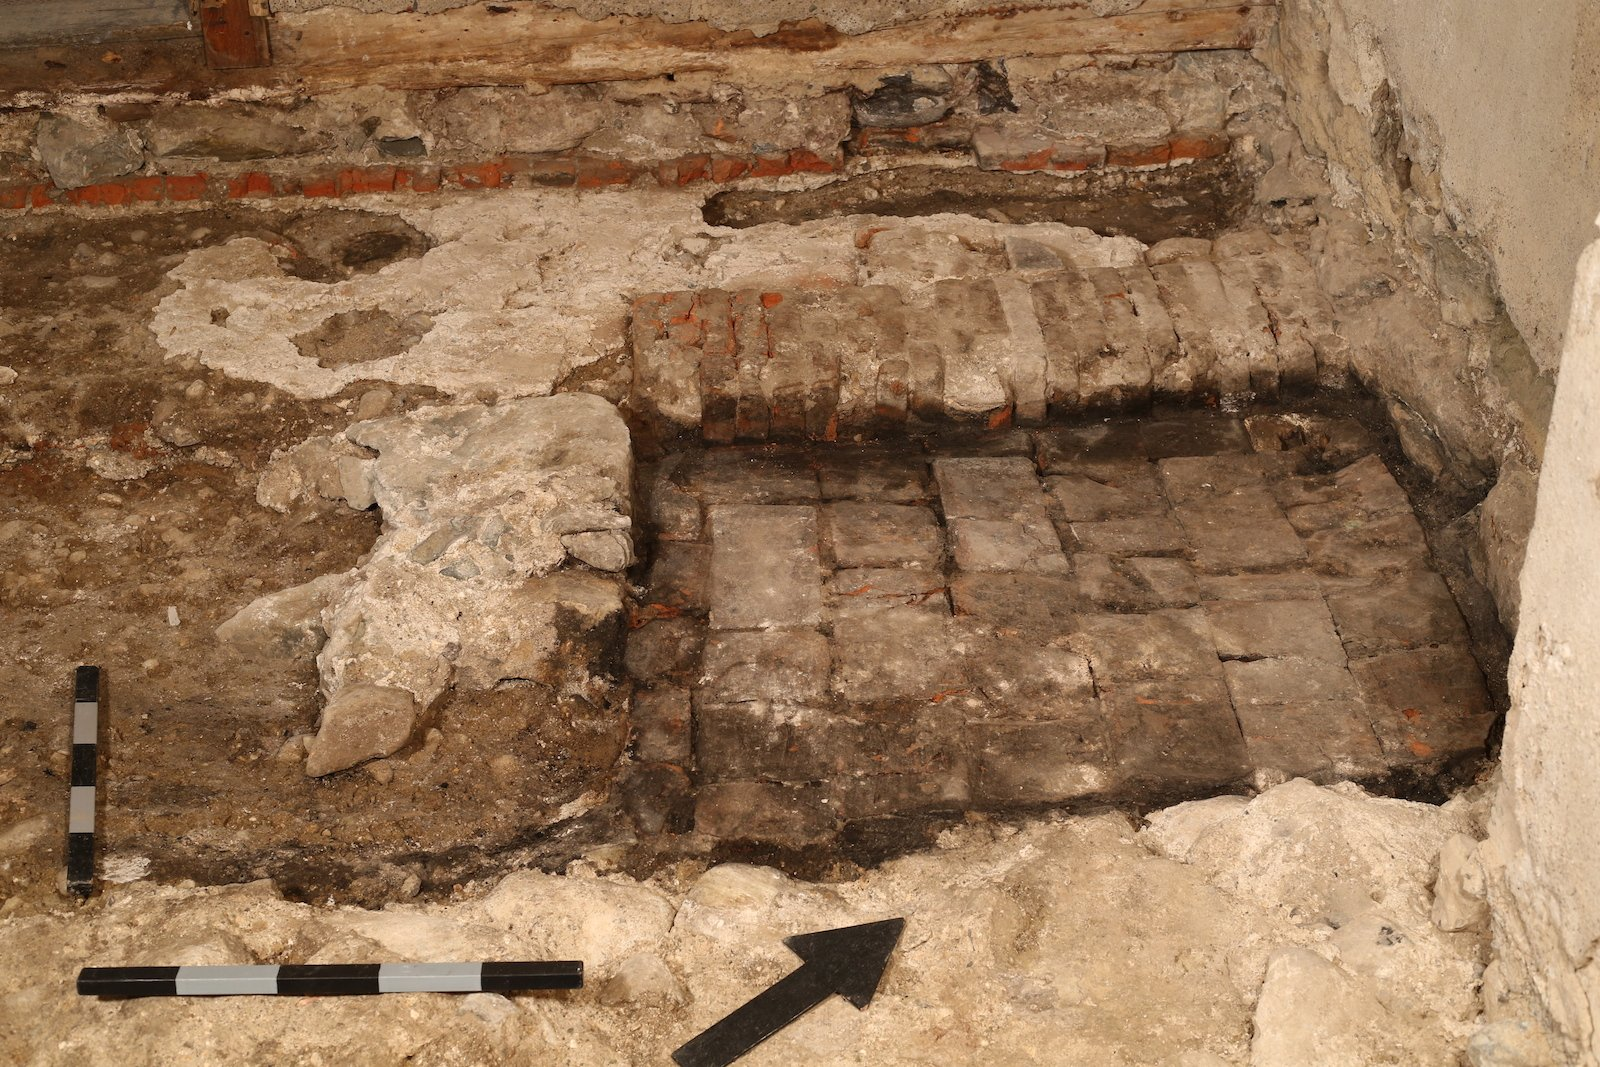 Im Sockelgeschoss der Brandruine, ehemals Kolinplatz 21, entdeckte man bei Ausgrabungen das Fundament eines mit Backsteinen gemauerten Backofens (Pfeil).